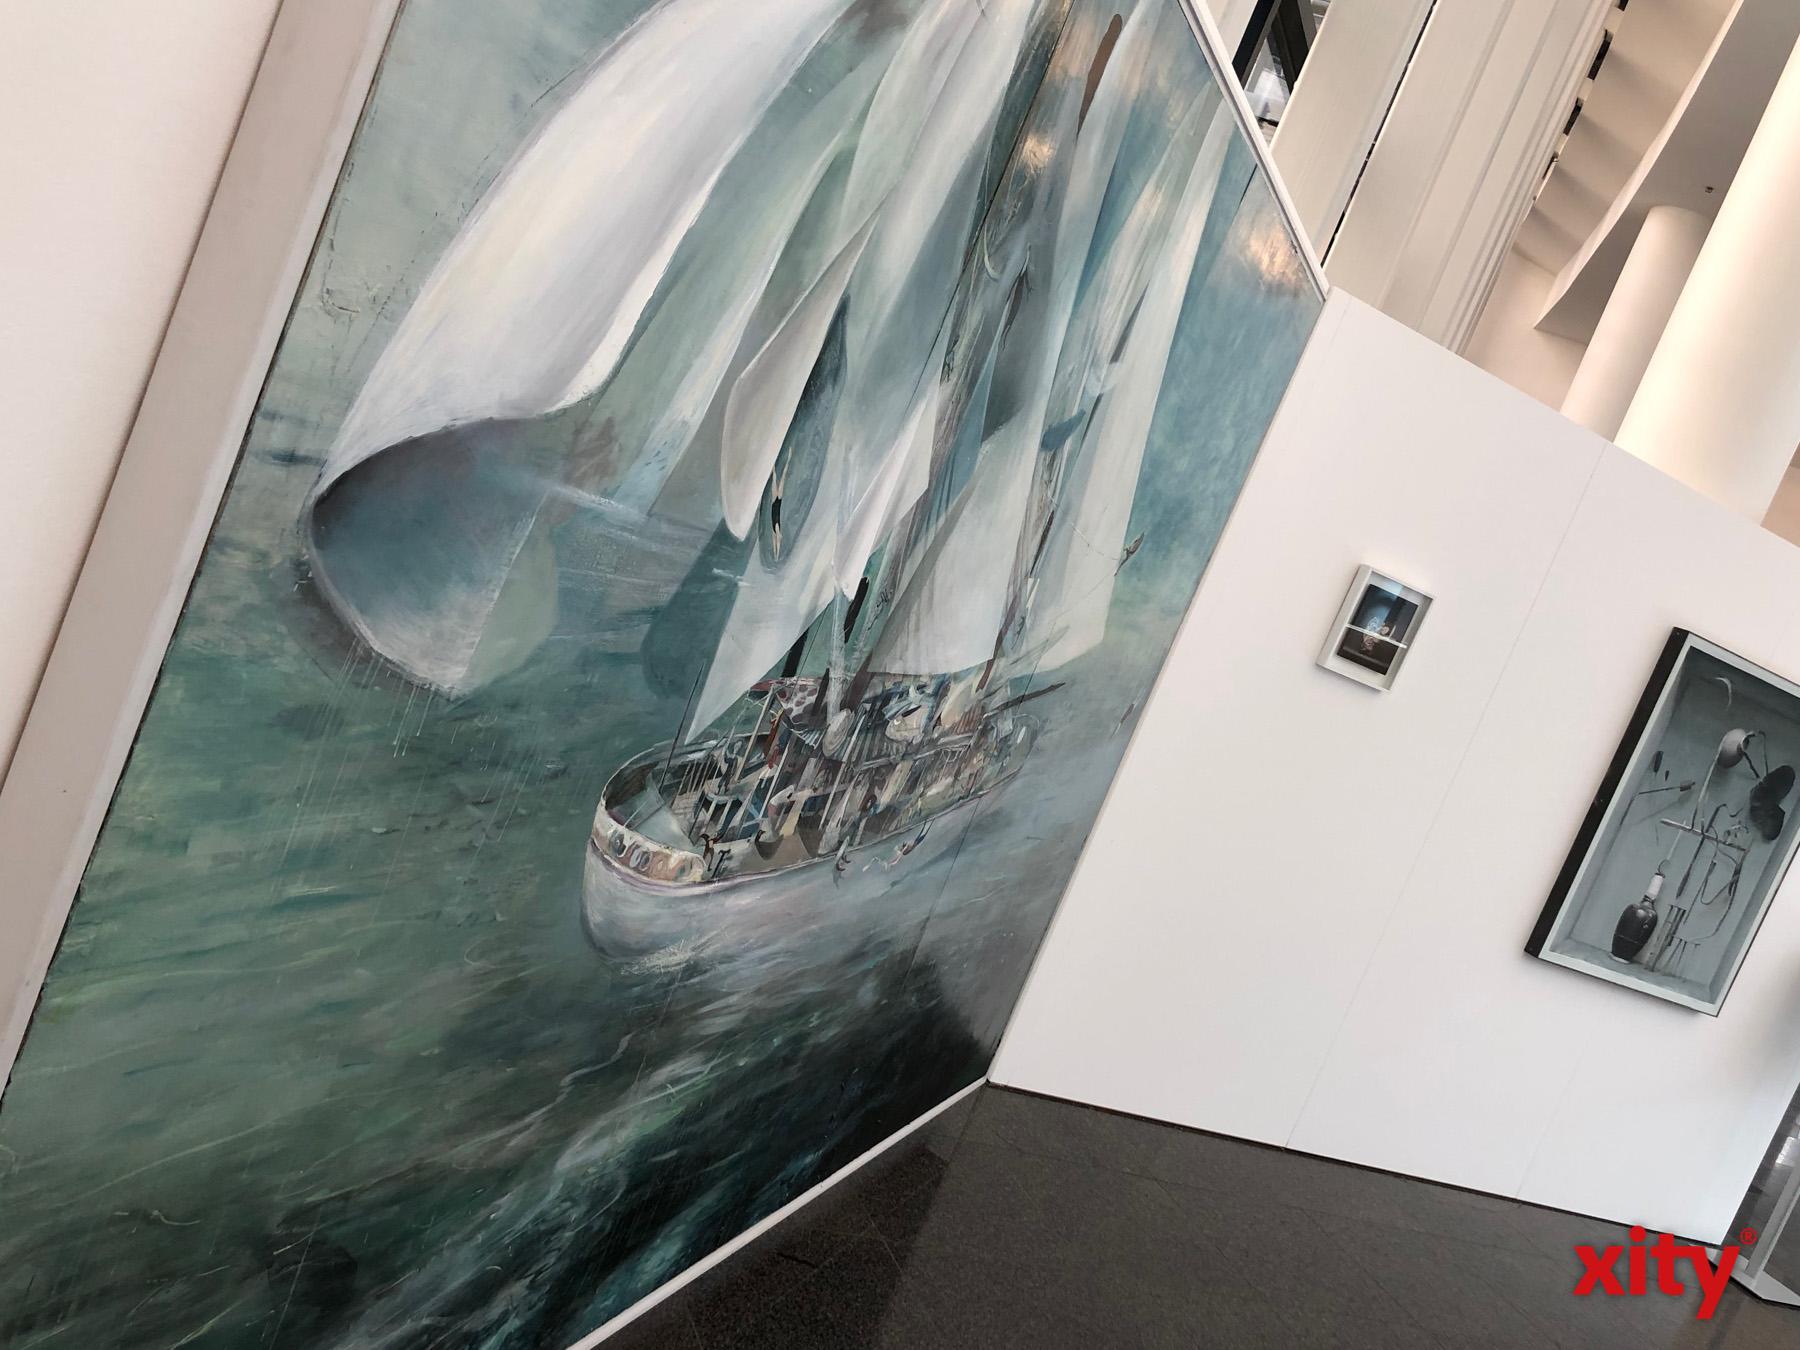 Großformatige Malereien werden ebenso gezeigt wie Skulpturen und Fotografien (Foto: xity)